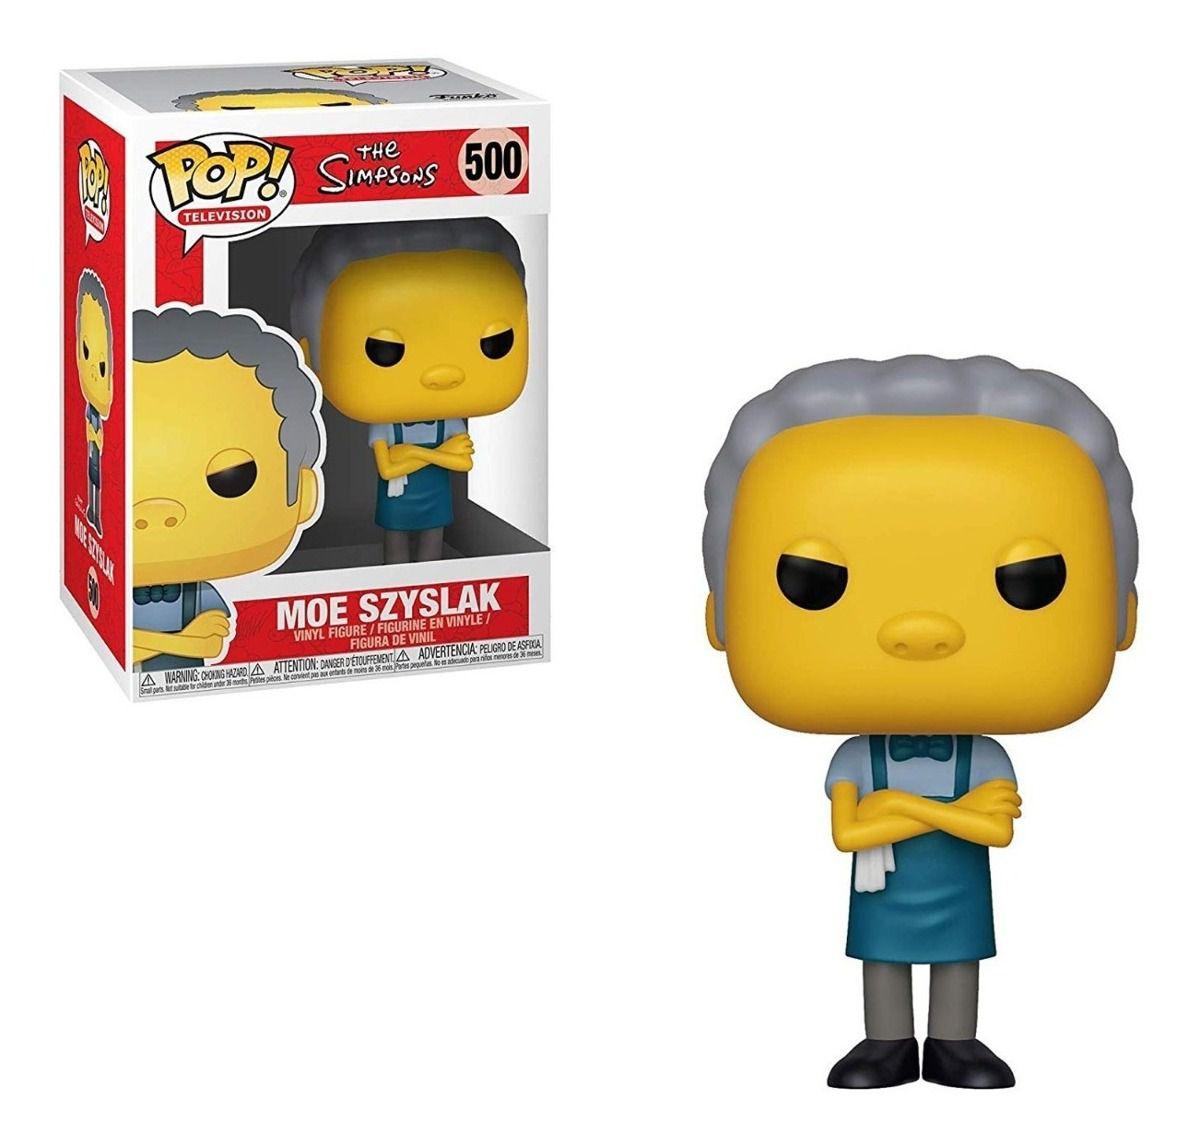 Moe Szyslak #500 - The Simpsons - Funko Pop! Television